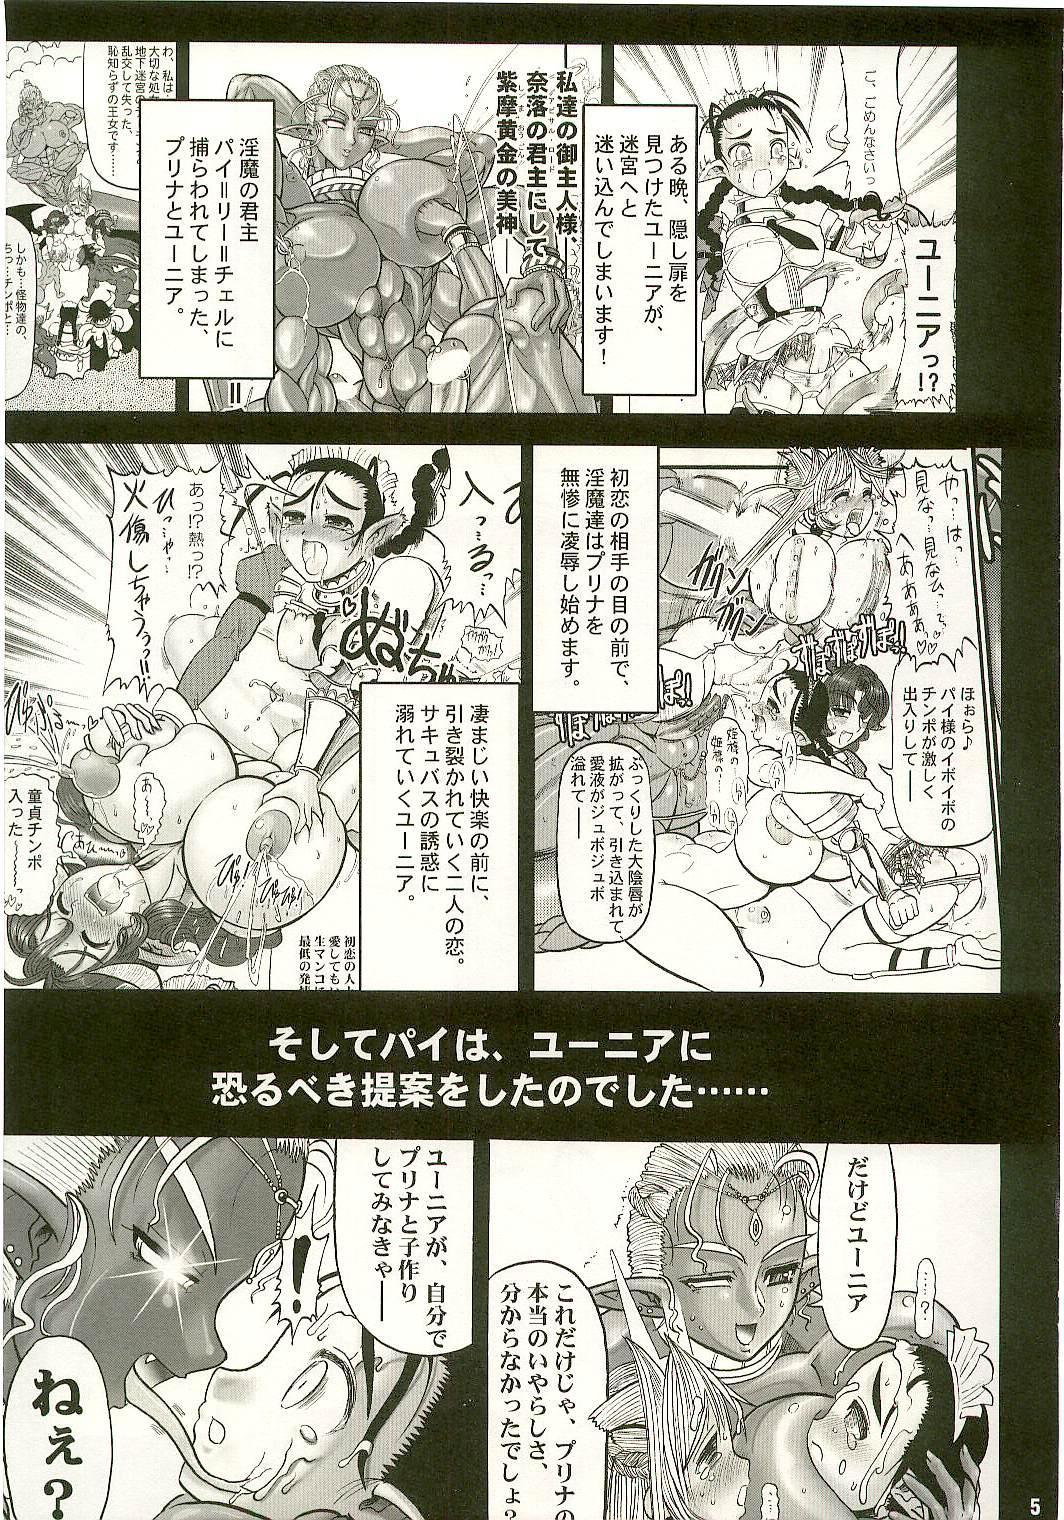 TGWOA Vol.17 - Meikyuu Oujo Prina 3 2